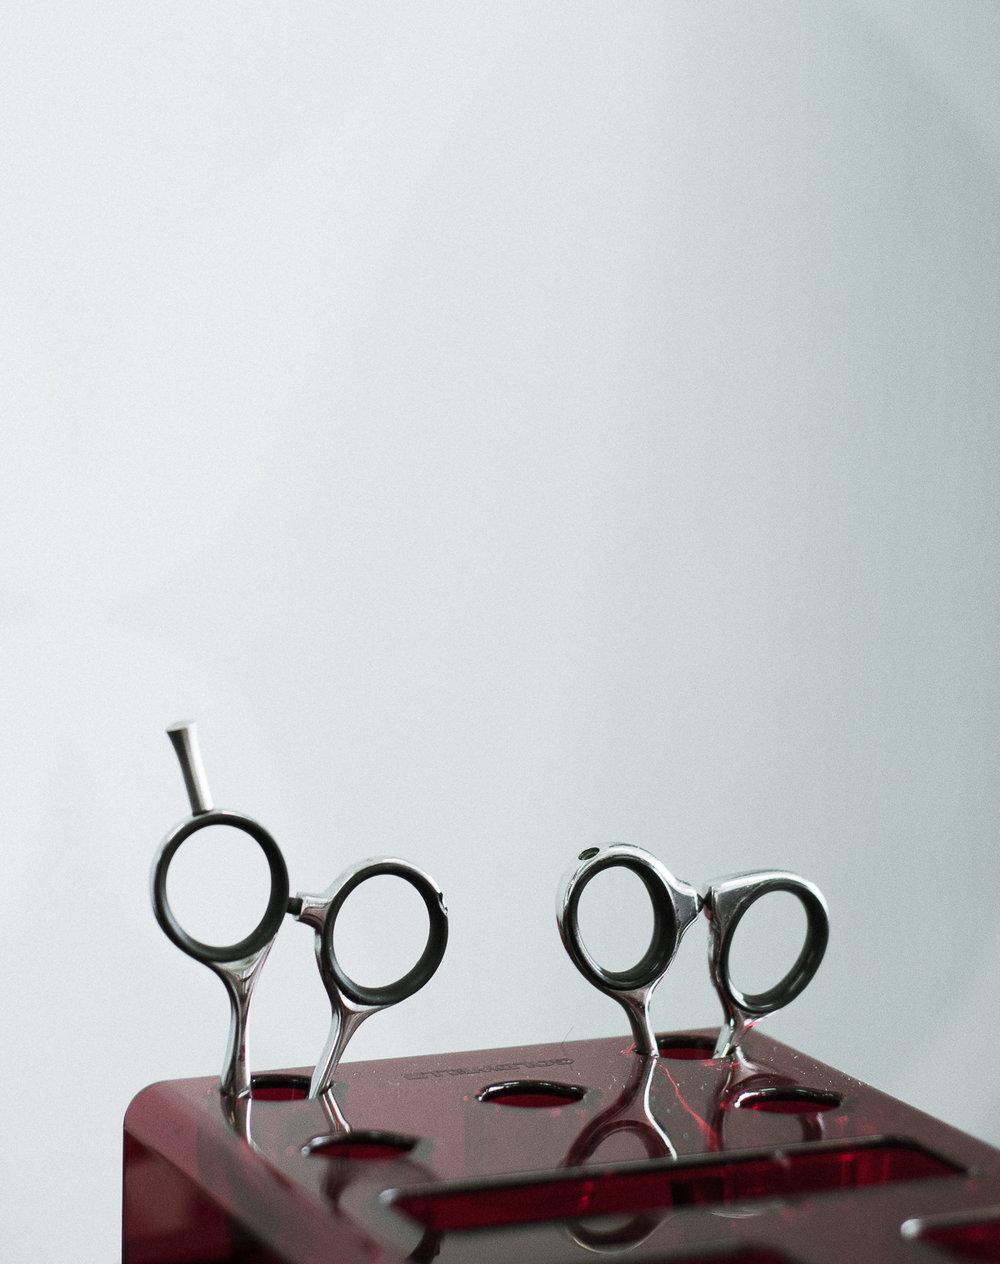 hairology-salon-vaughan-7.jpg